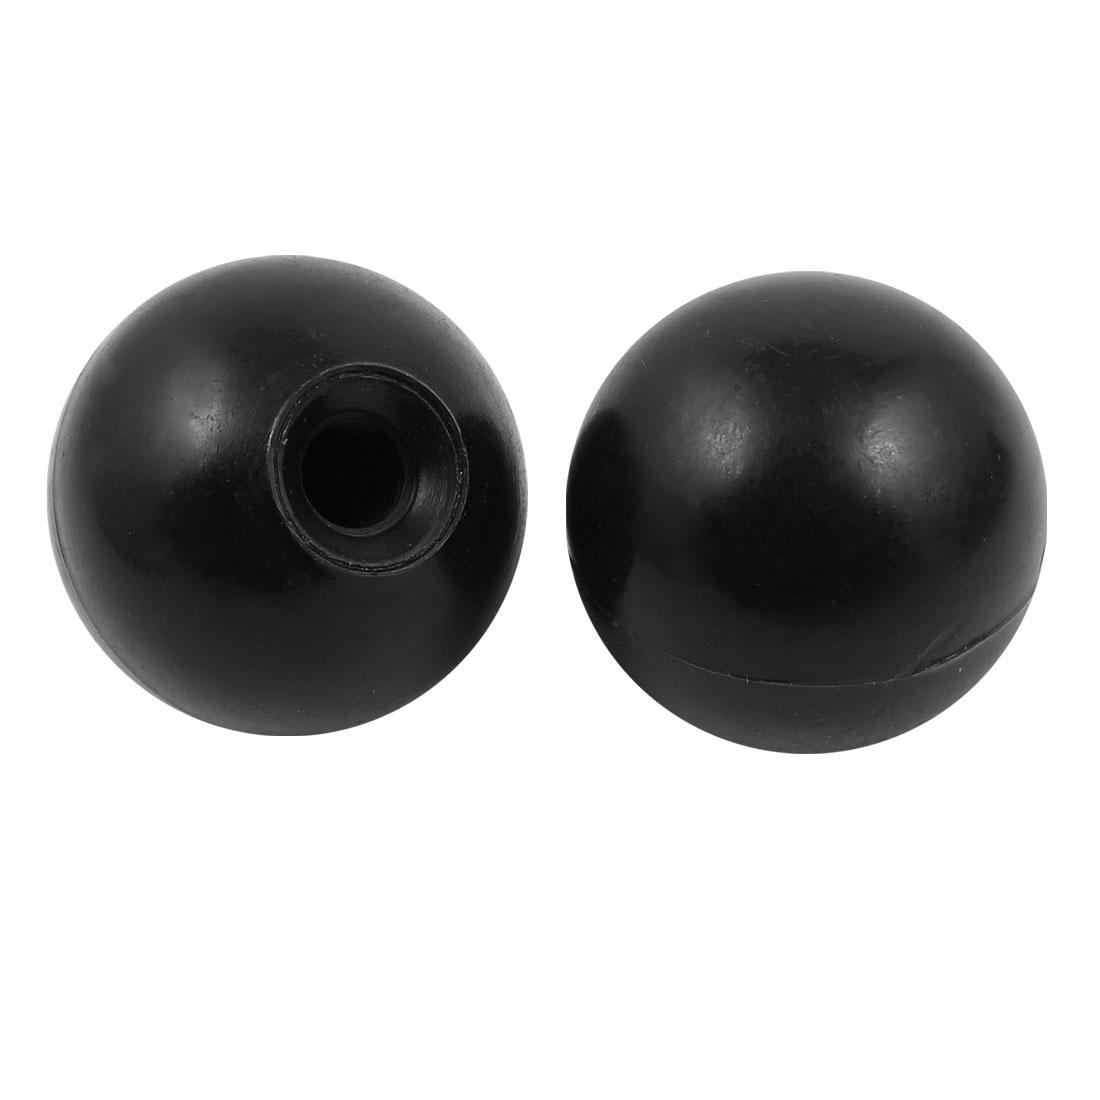 2Pcs Plastic Round Handle Ball Knob M10 Threaded 40mm Dia Machine Tools Black